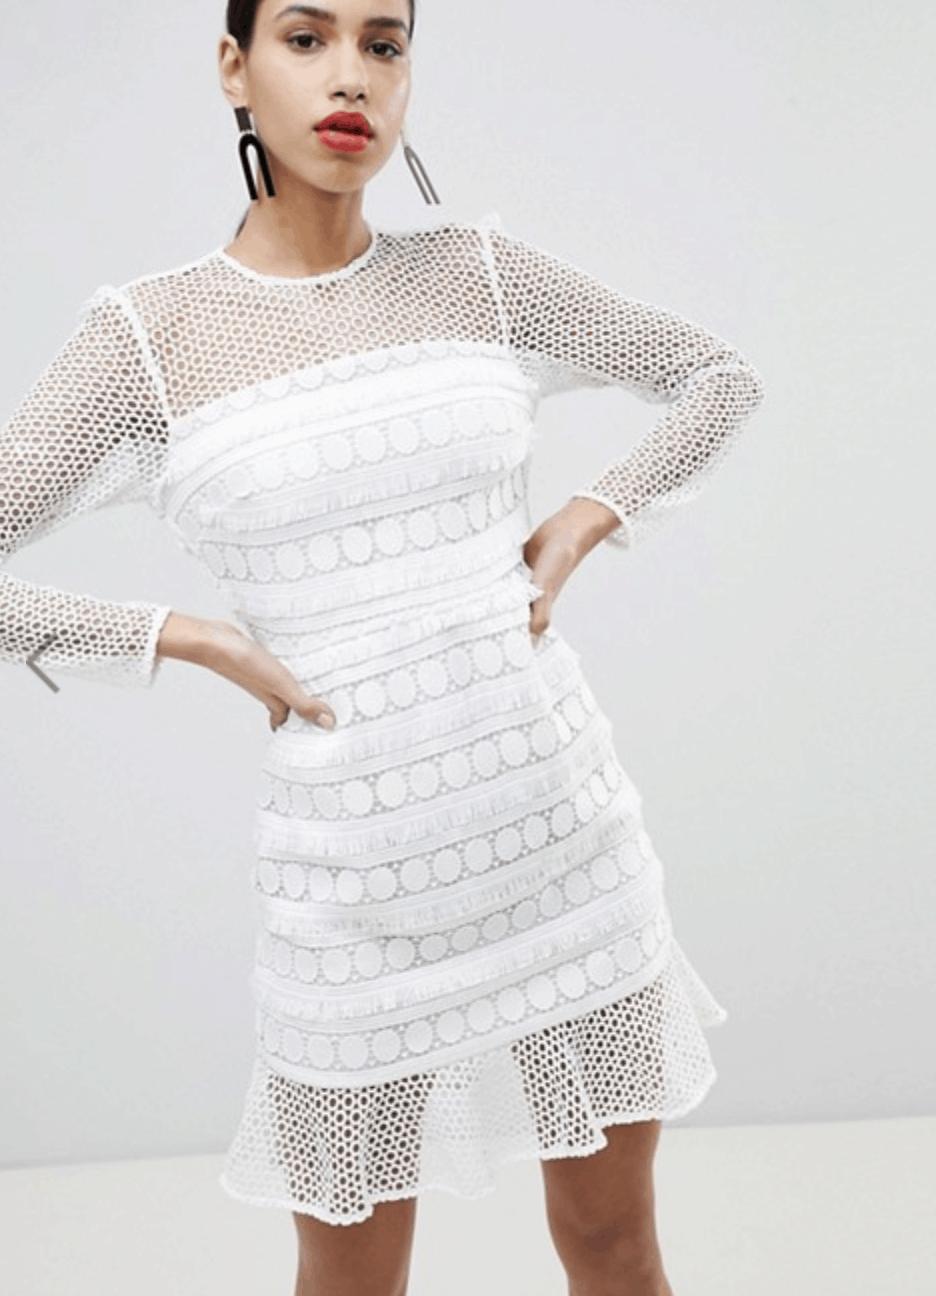 model in long sleeve, white, net shift dress.